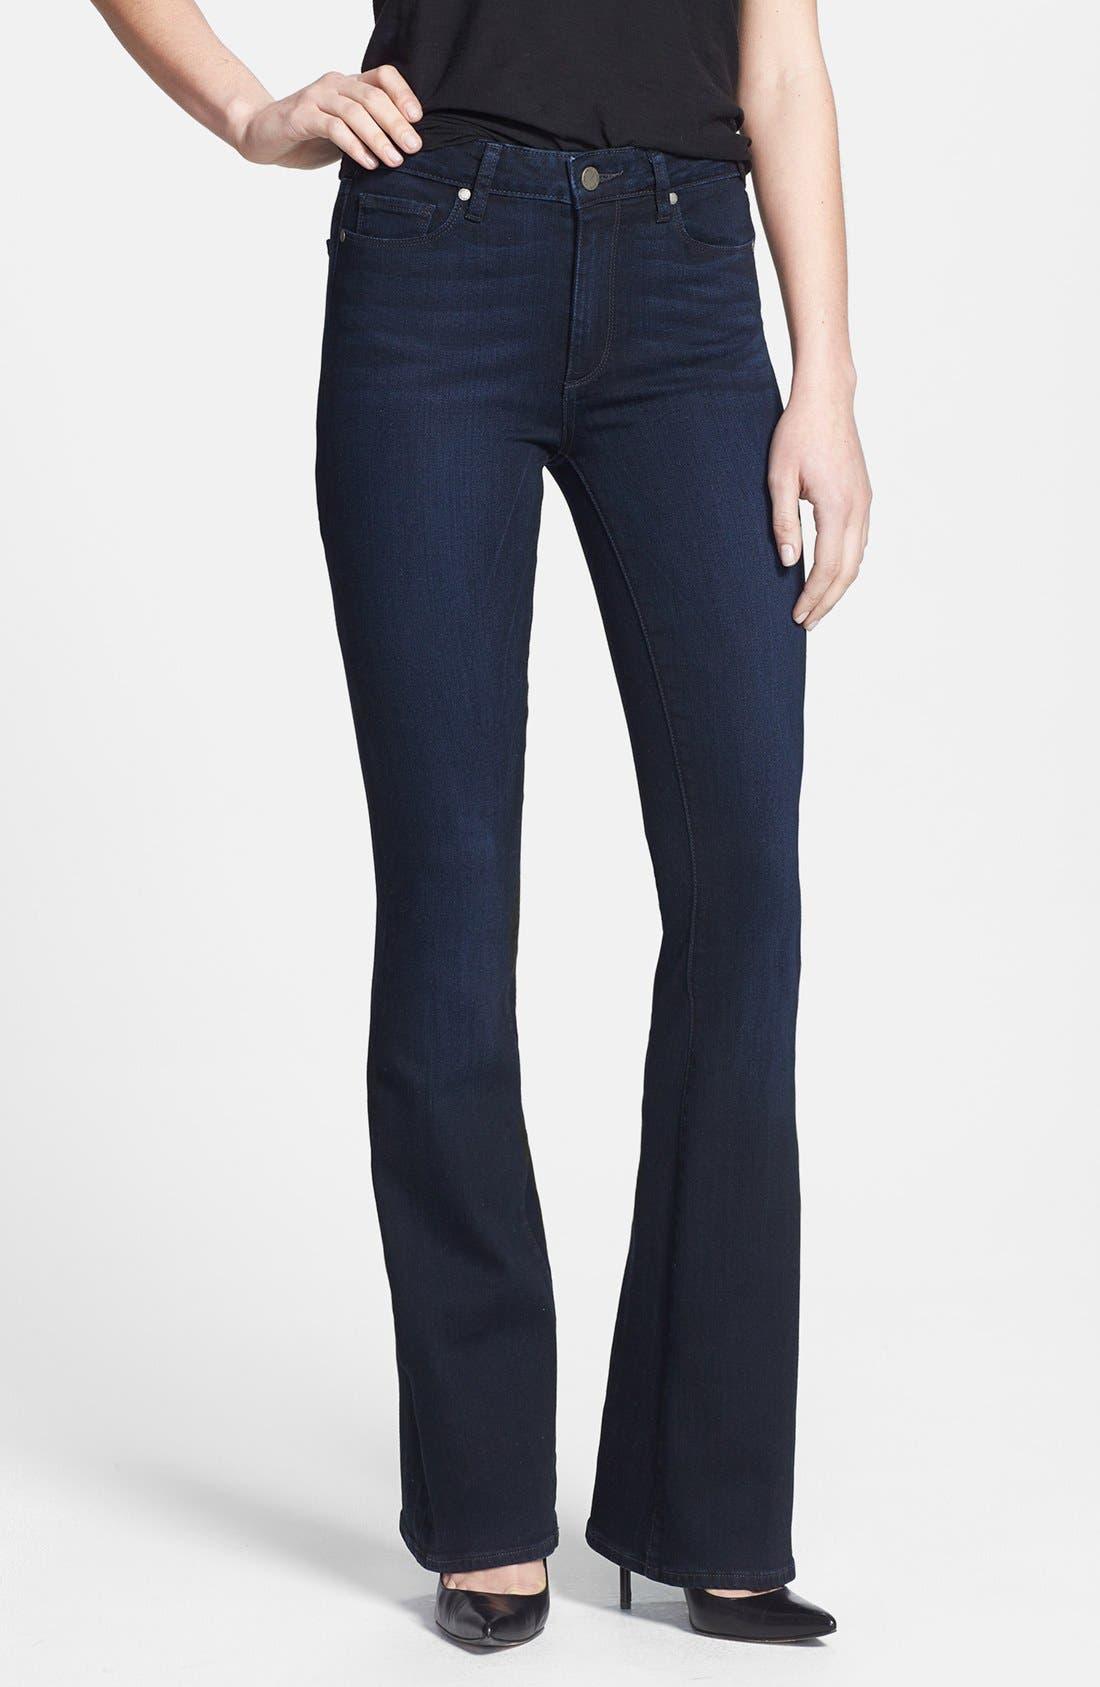 Main Image - Paige Denim 'Canyon' High Rise Bell Bottom Jeans (Peyton)